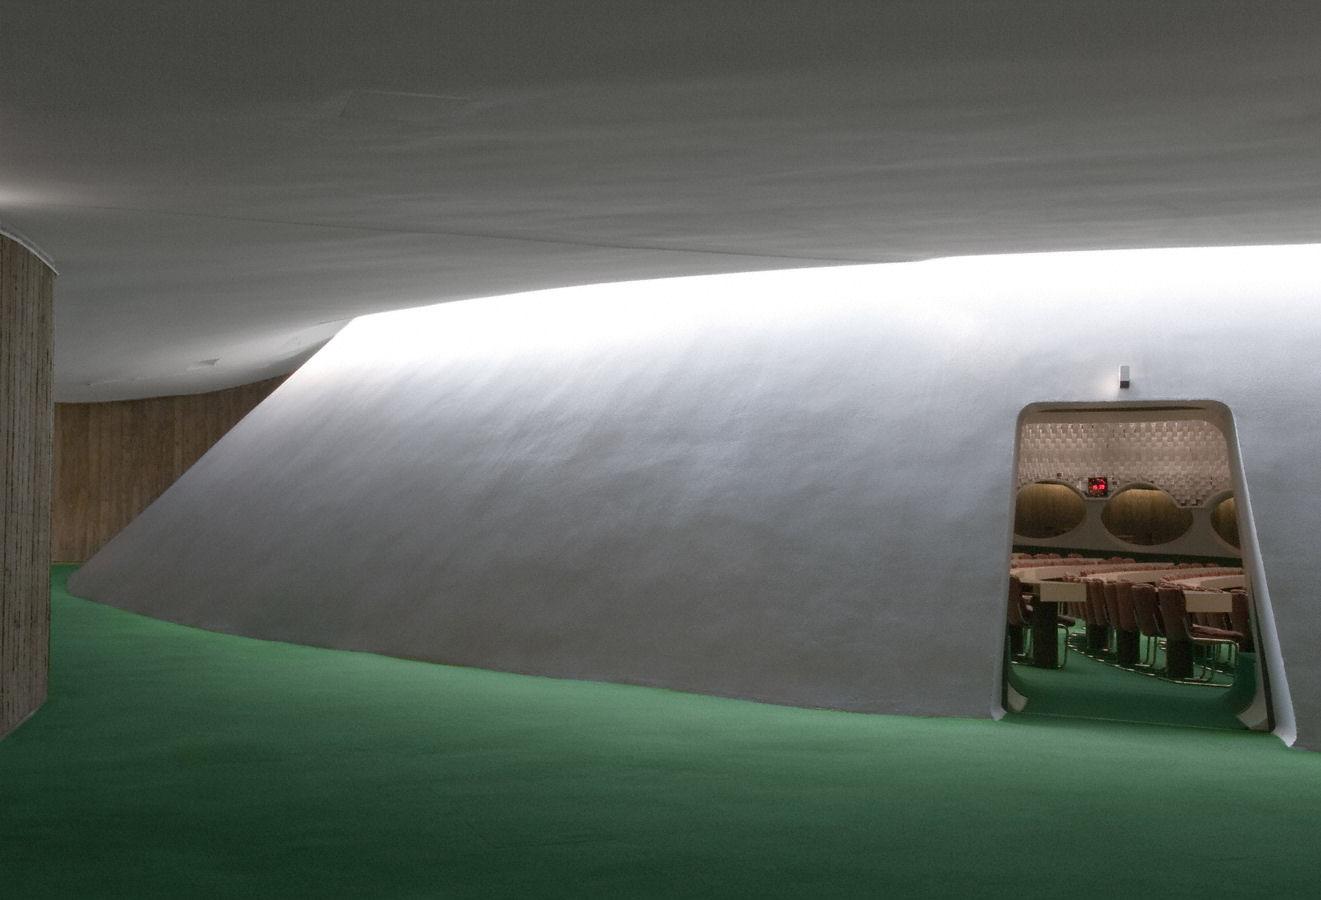 parti communiste français - architect: Oscar Niemeyer